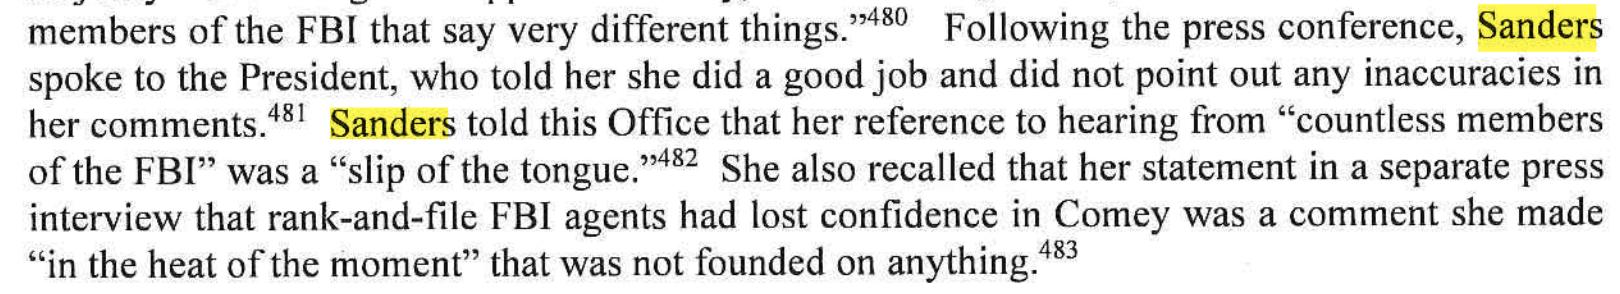 Excerpt of the Mueller report regarding White House press secretary Sarah Sanders' statements about former FBI Director James Comey.